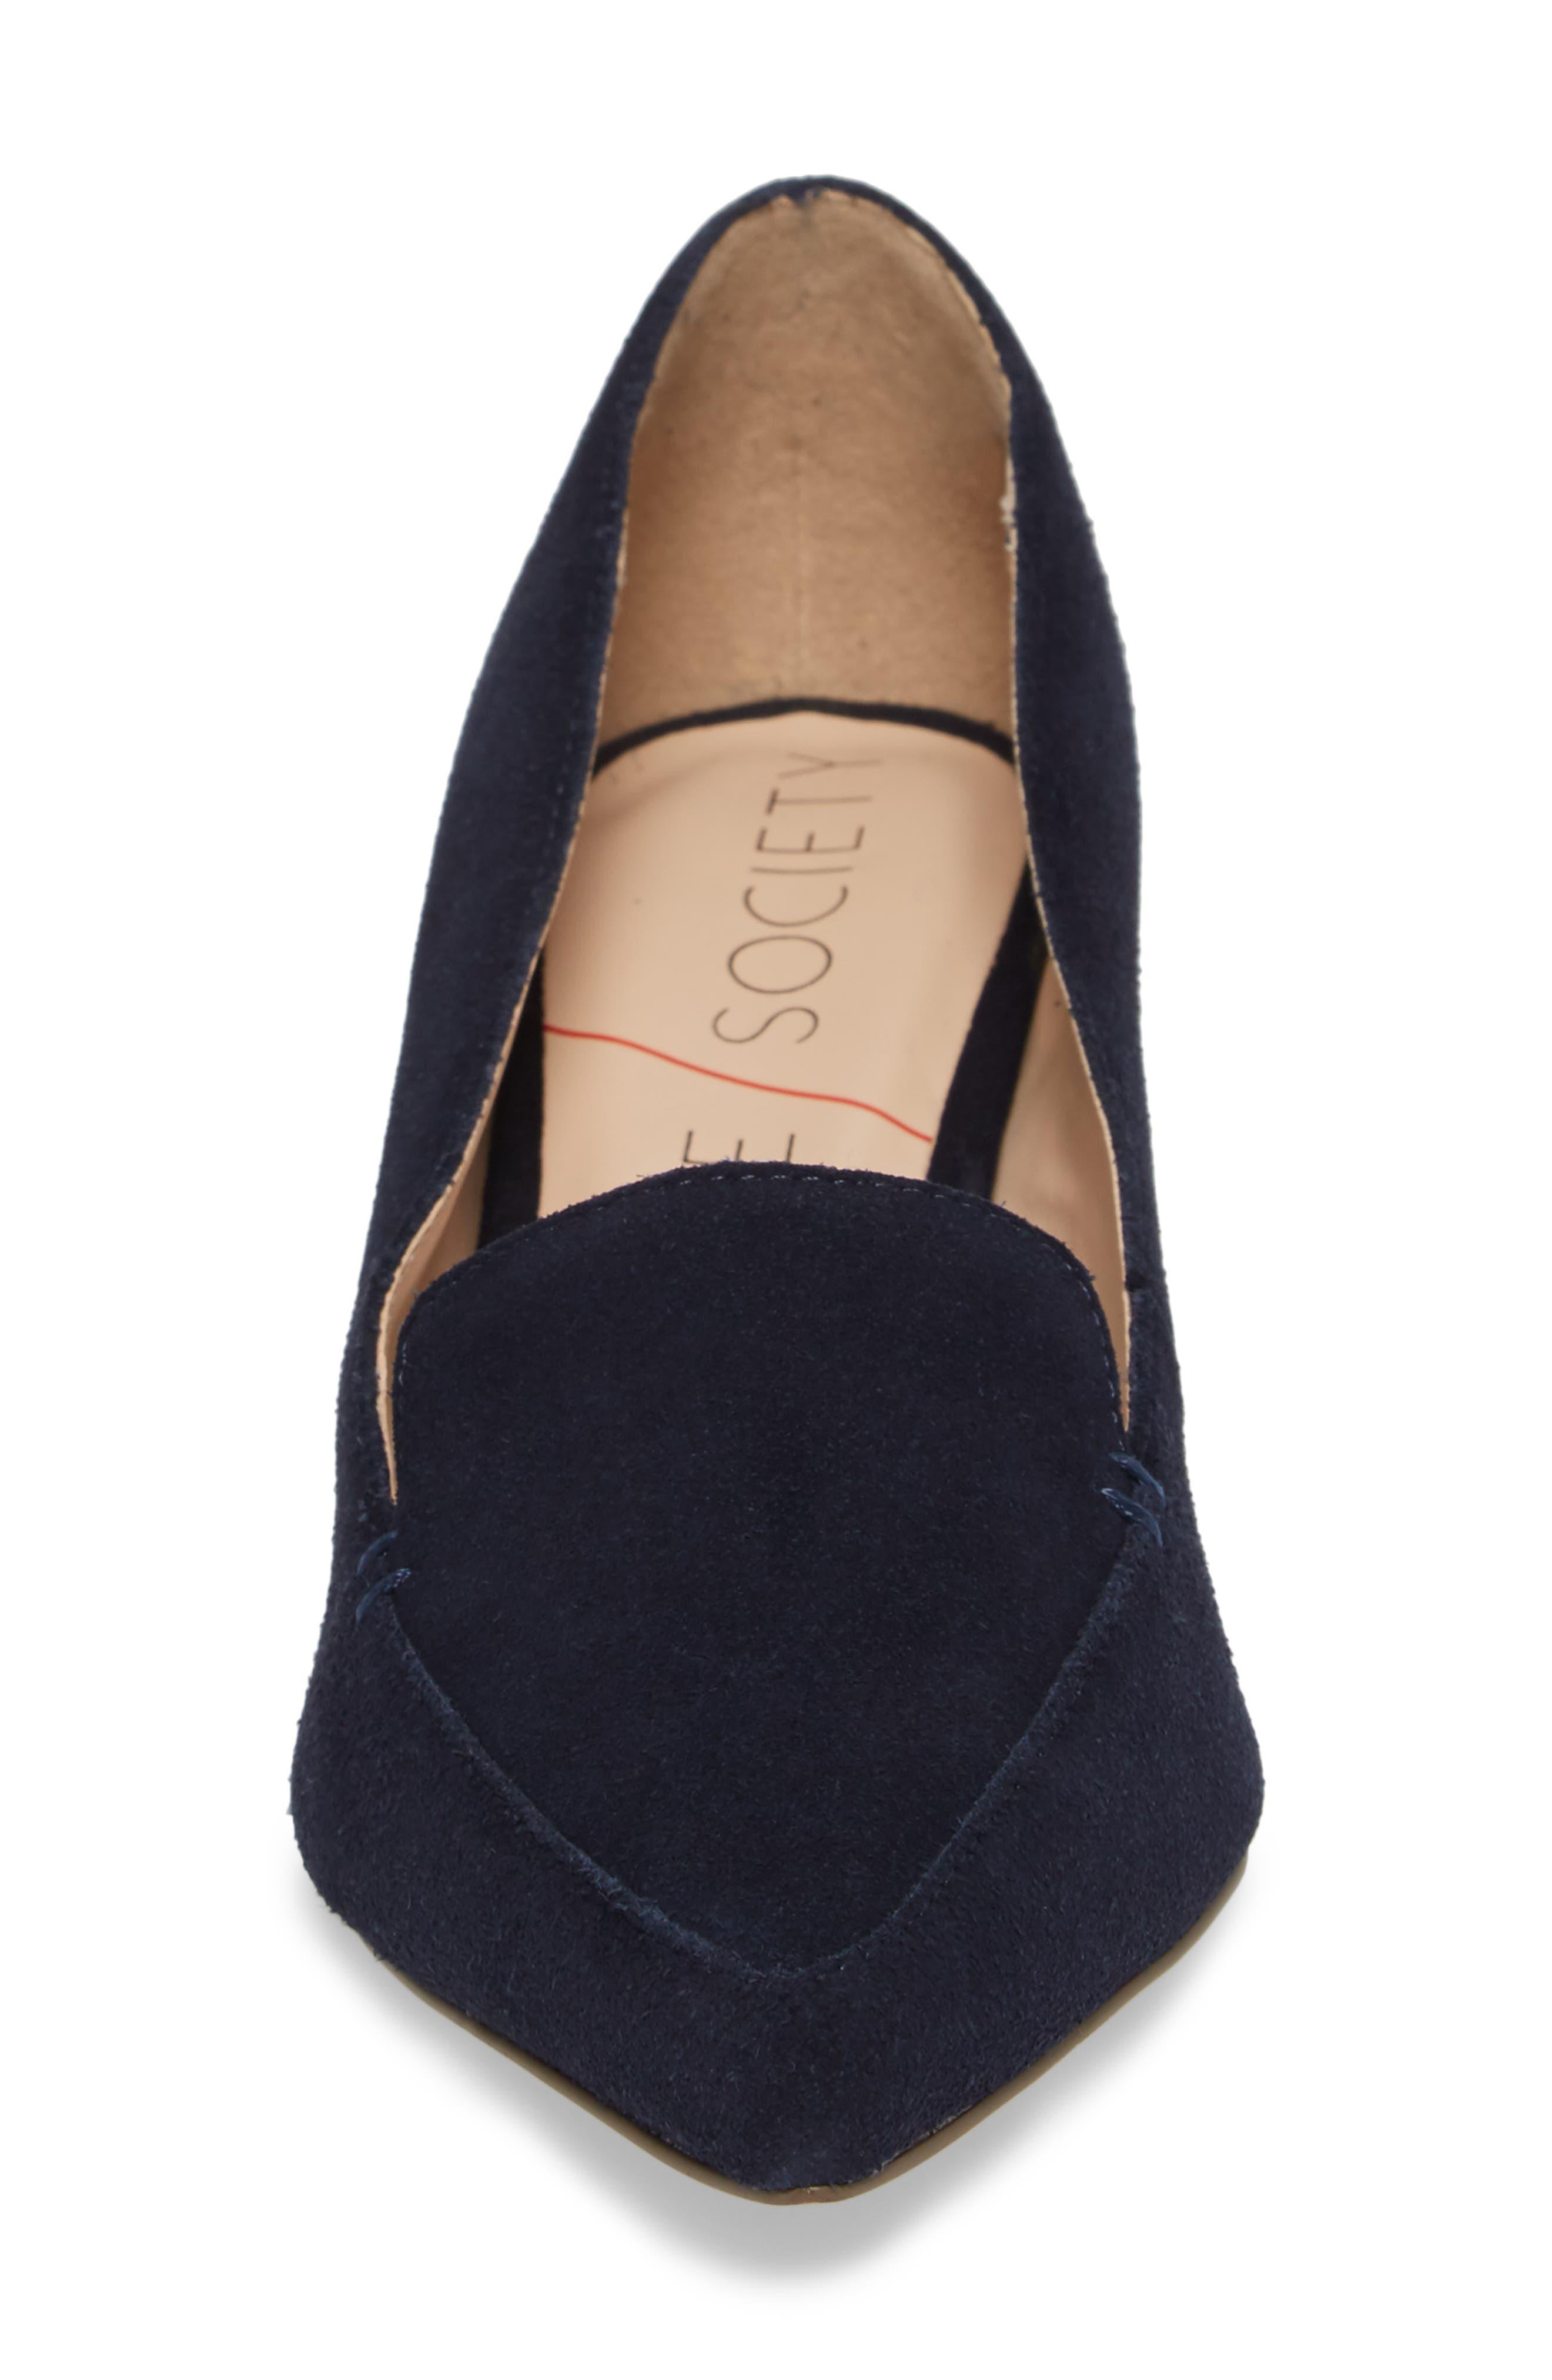 SOLE SOCIETY, Mavis Flare Heel Loafer, Alternate thumbnail 4, color, OMBRE BLUE